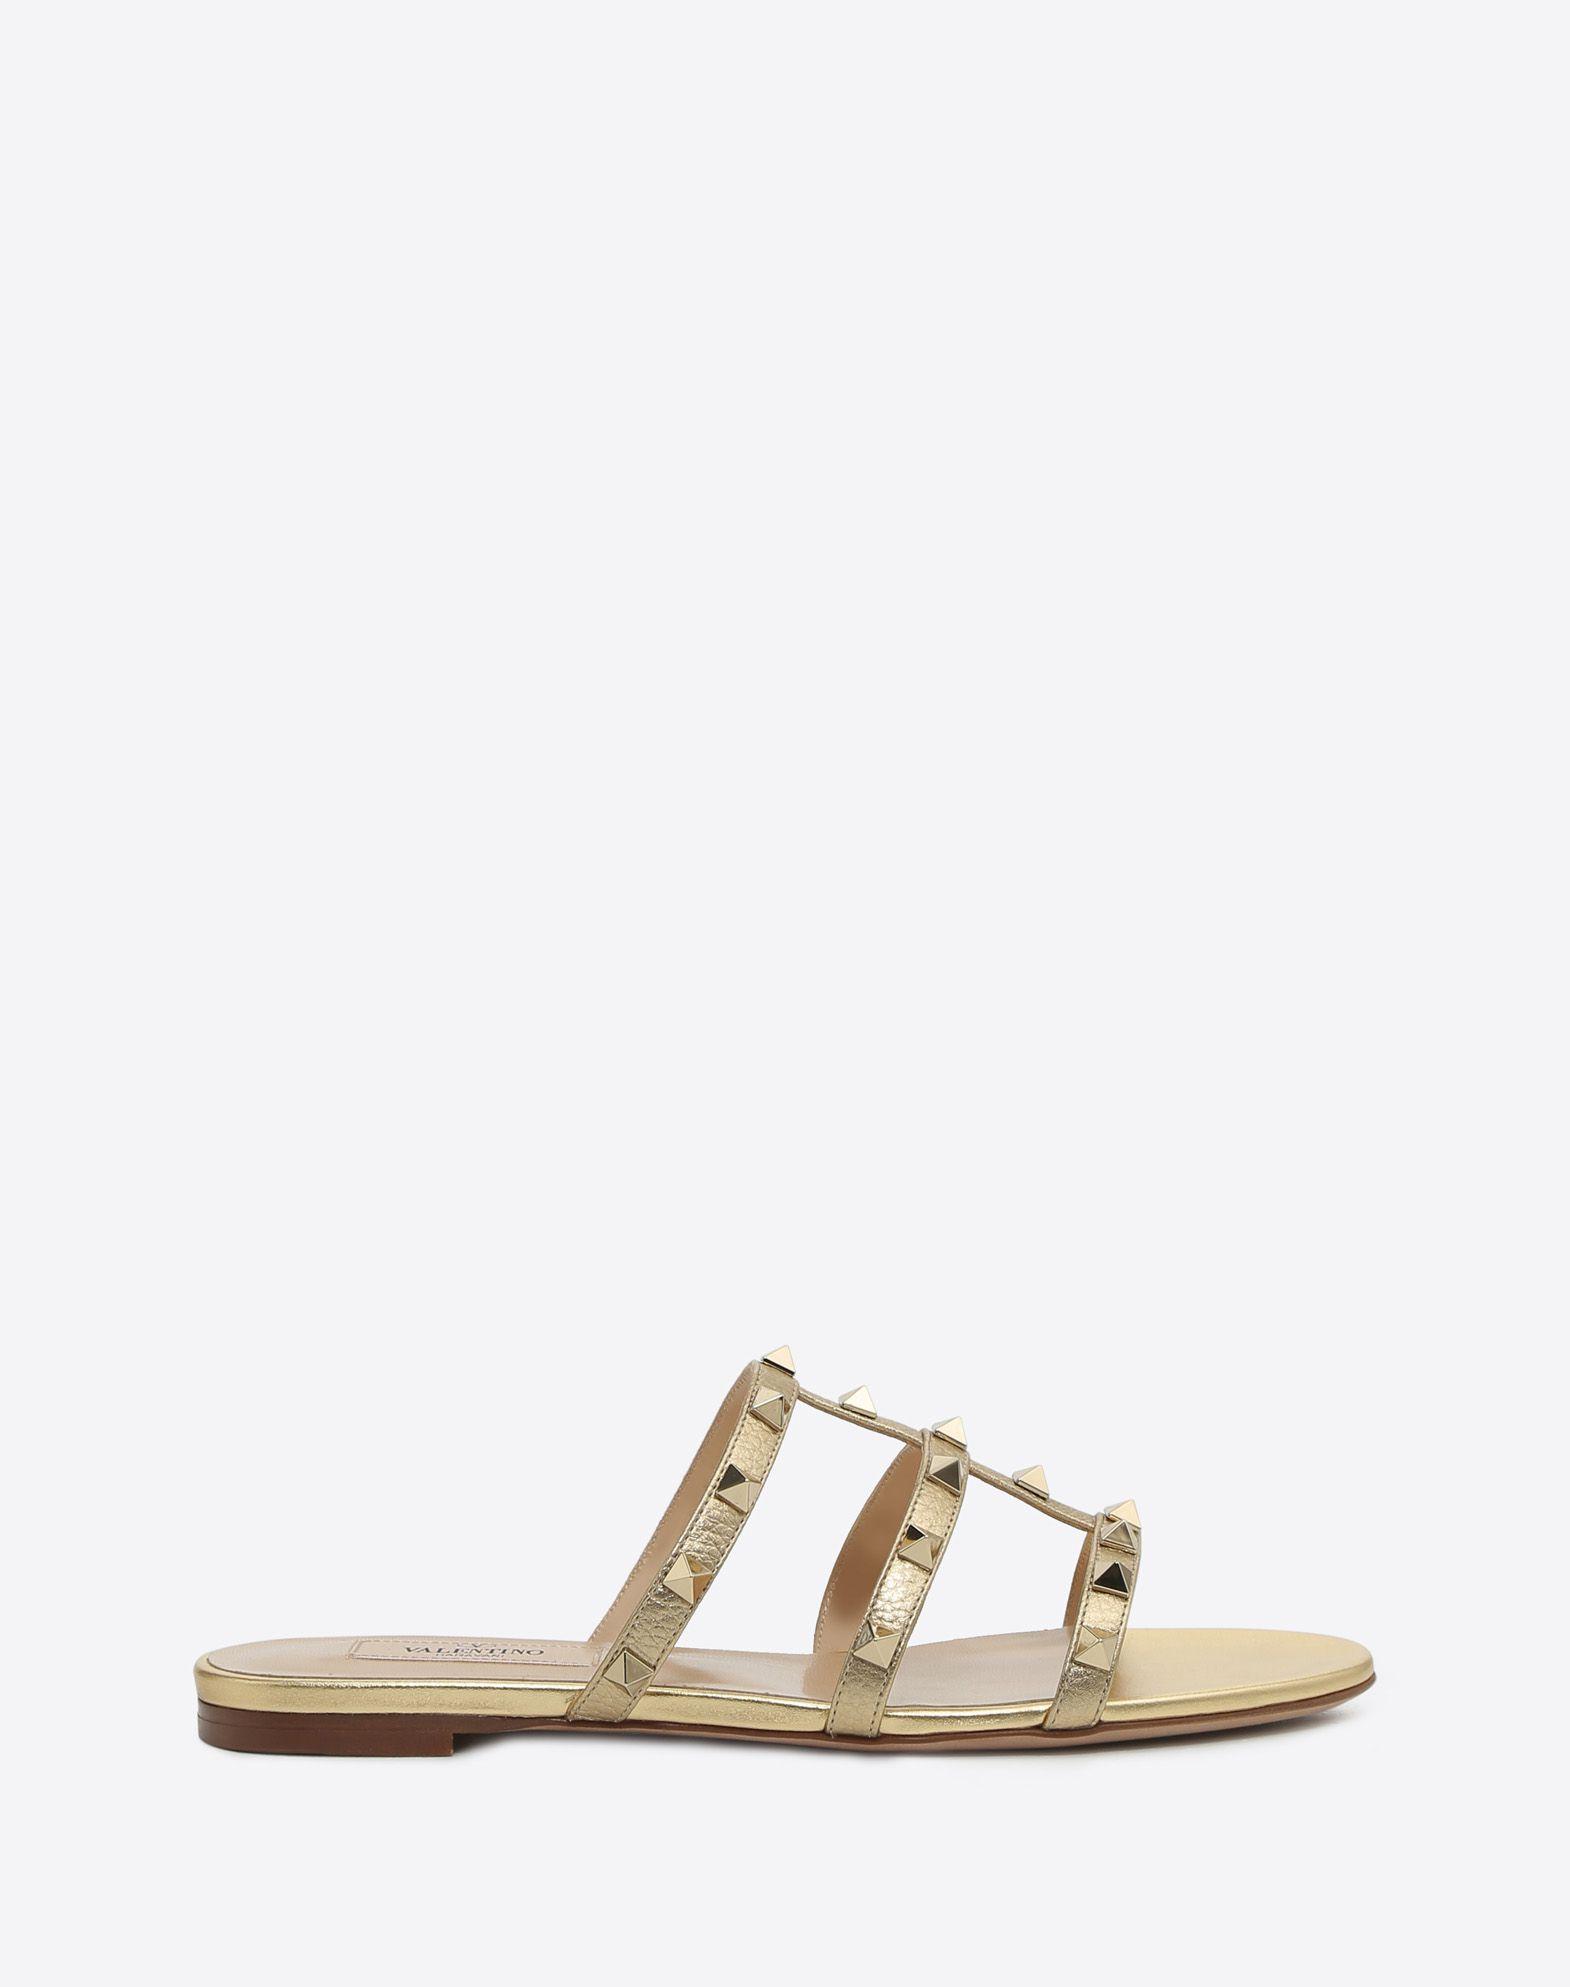 VALENTINO GARAVANI Rockstud slide sandal SLIDE SANDAL D f